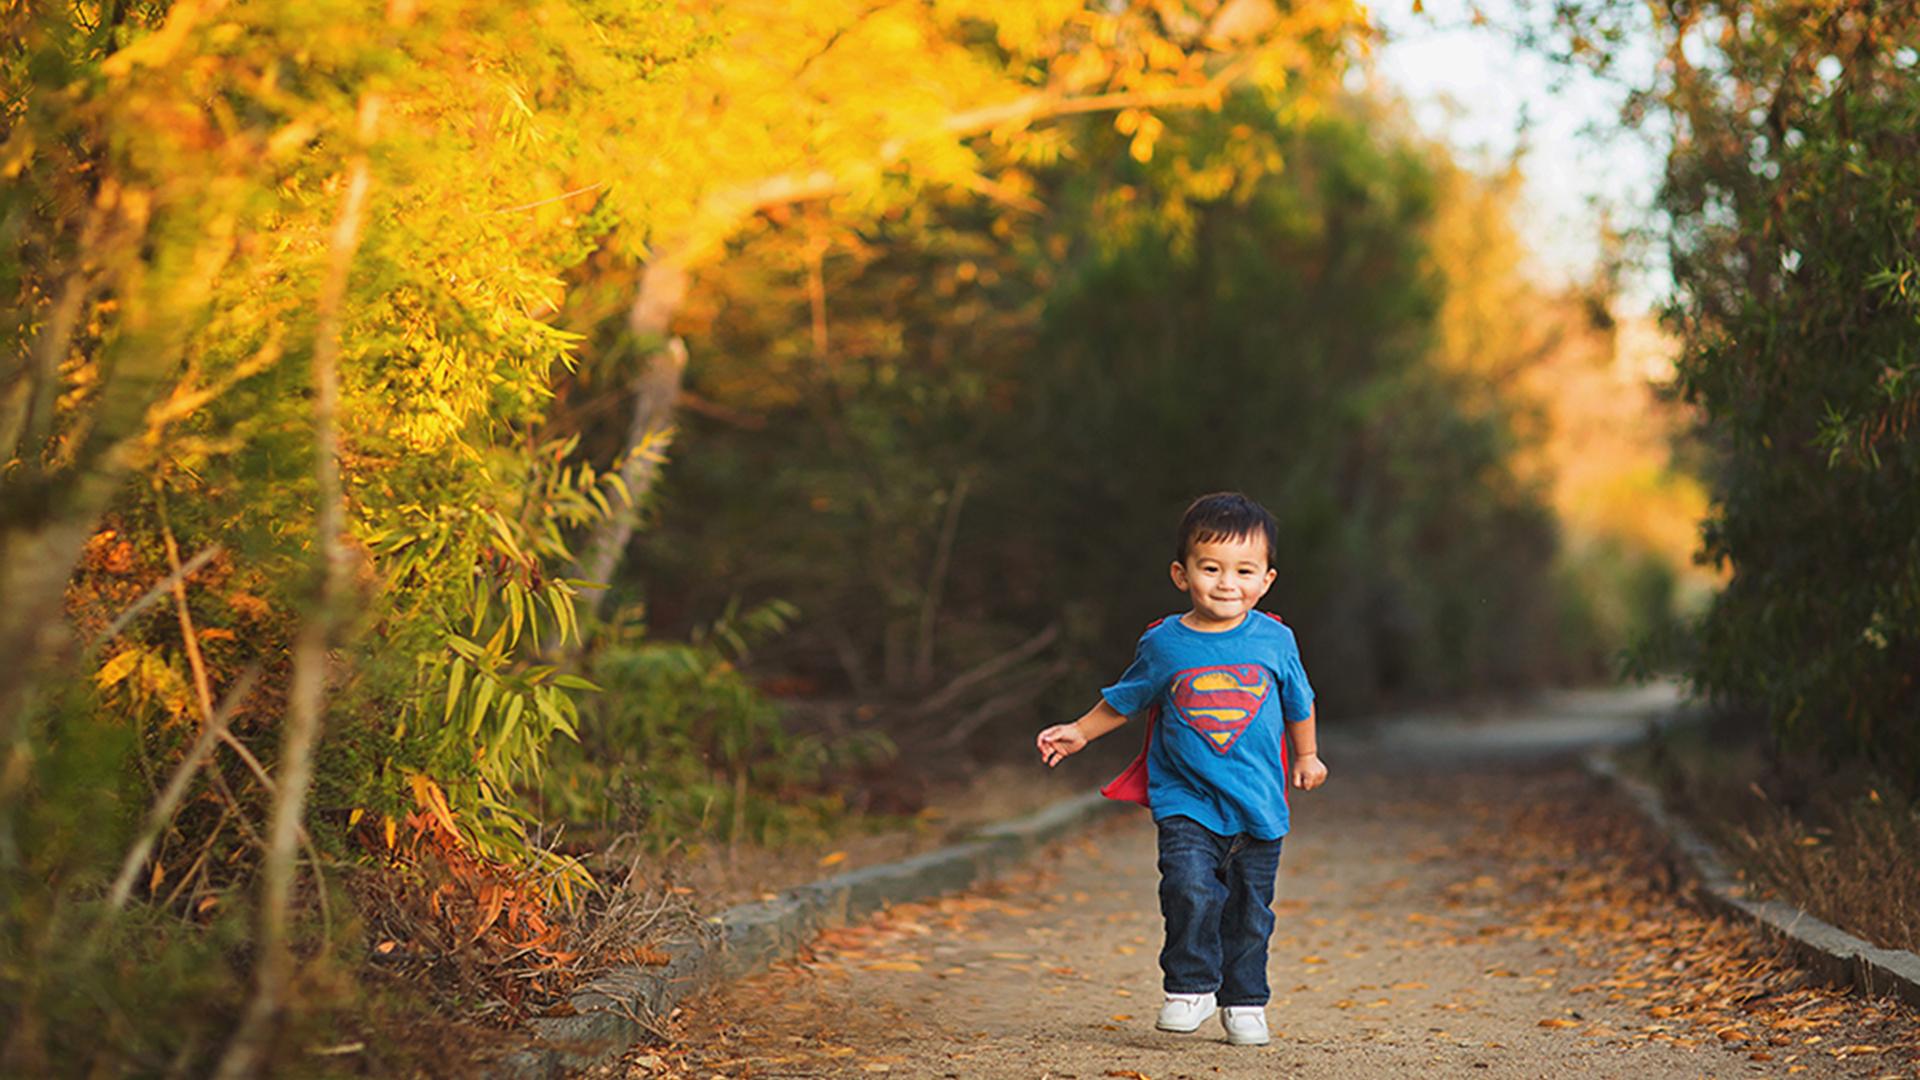 10 Tips To Shoot Great Family Photos Using Autumn S Backdrop